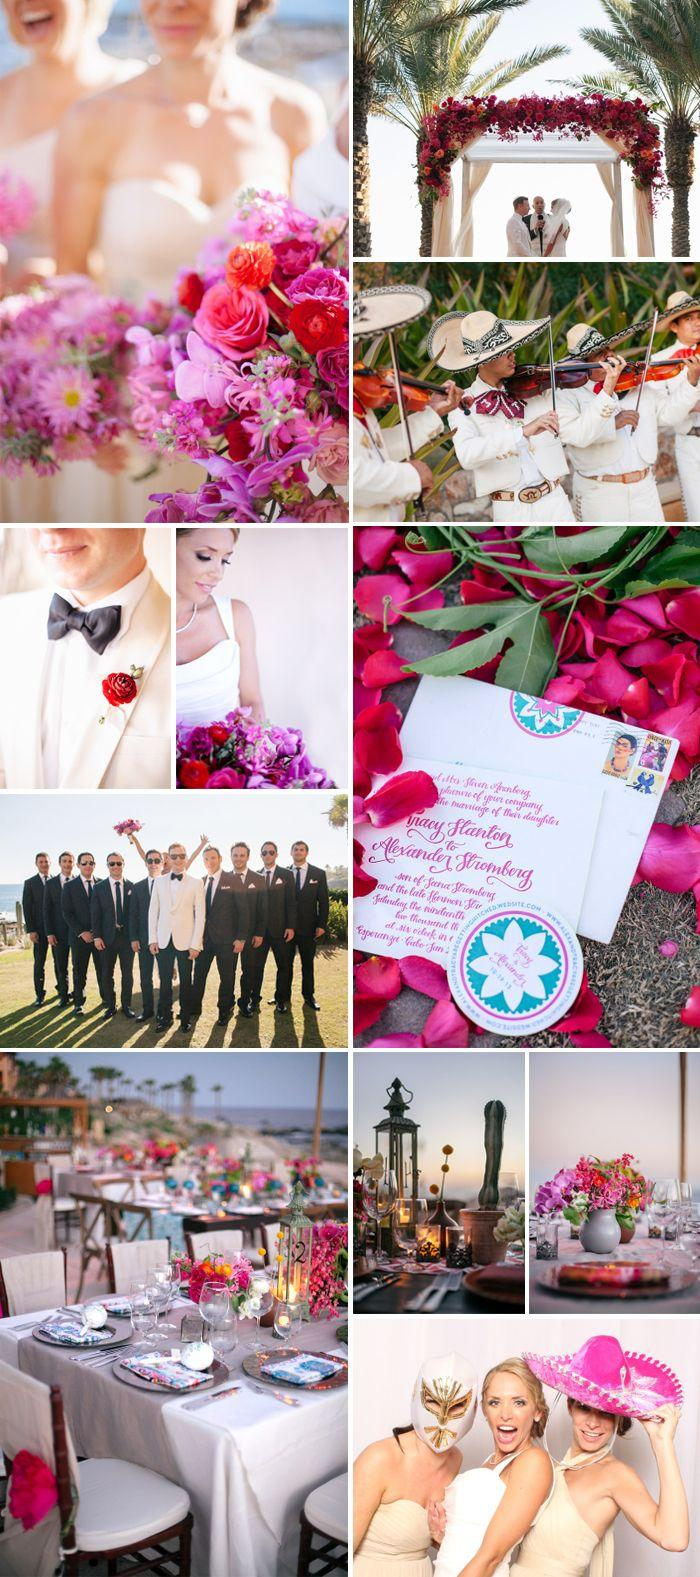 زفاف - Bright Wedding Inspiration